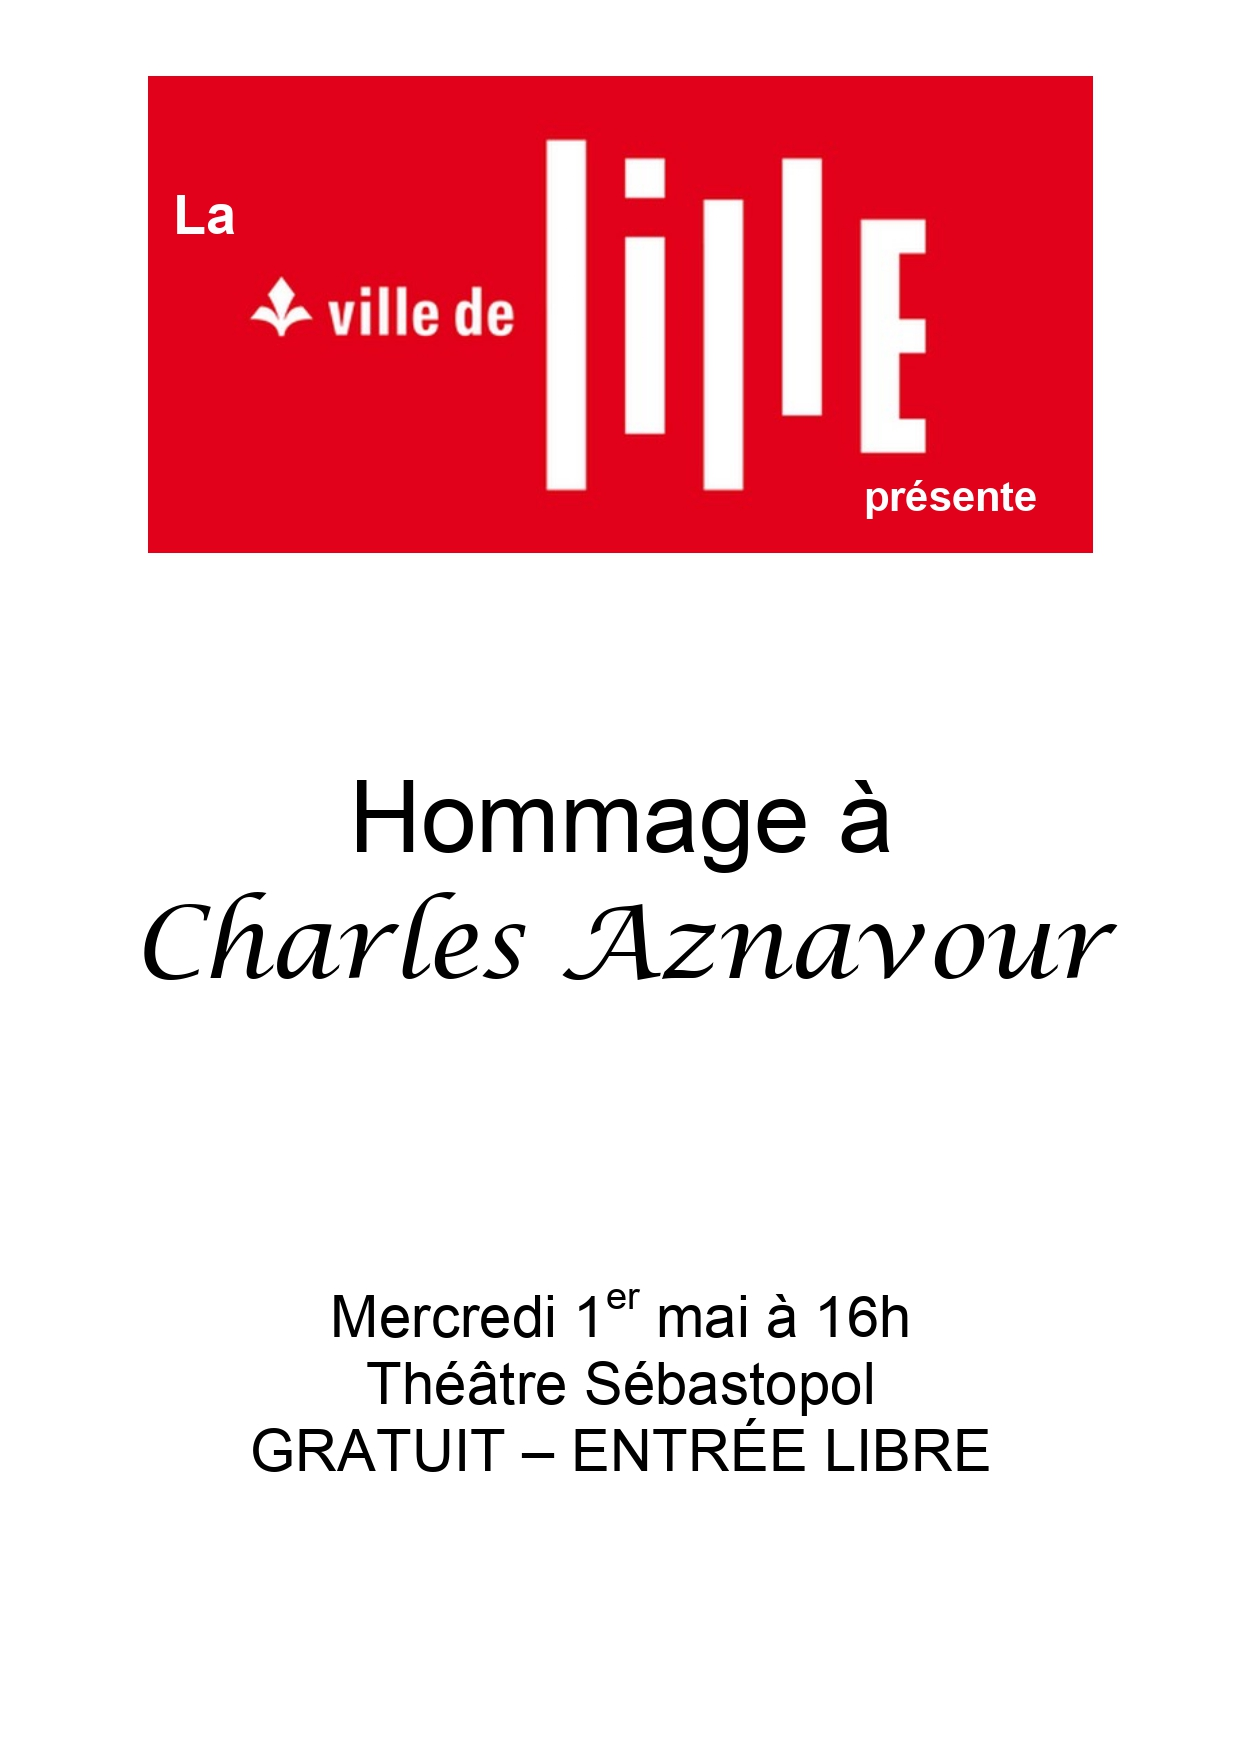 SPECTACLE DU 1ER MAI : Hommage à Charles Aznavour